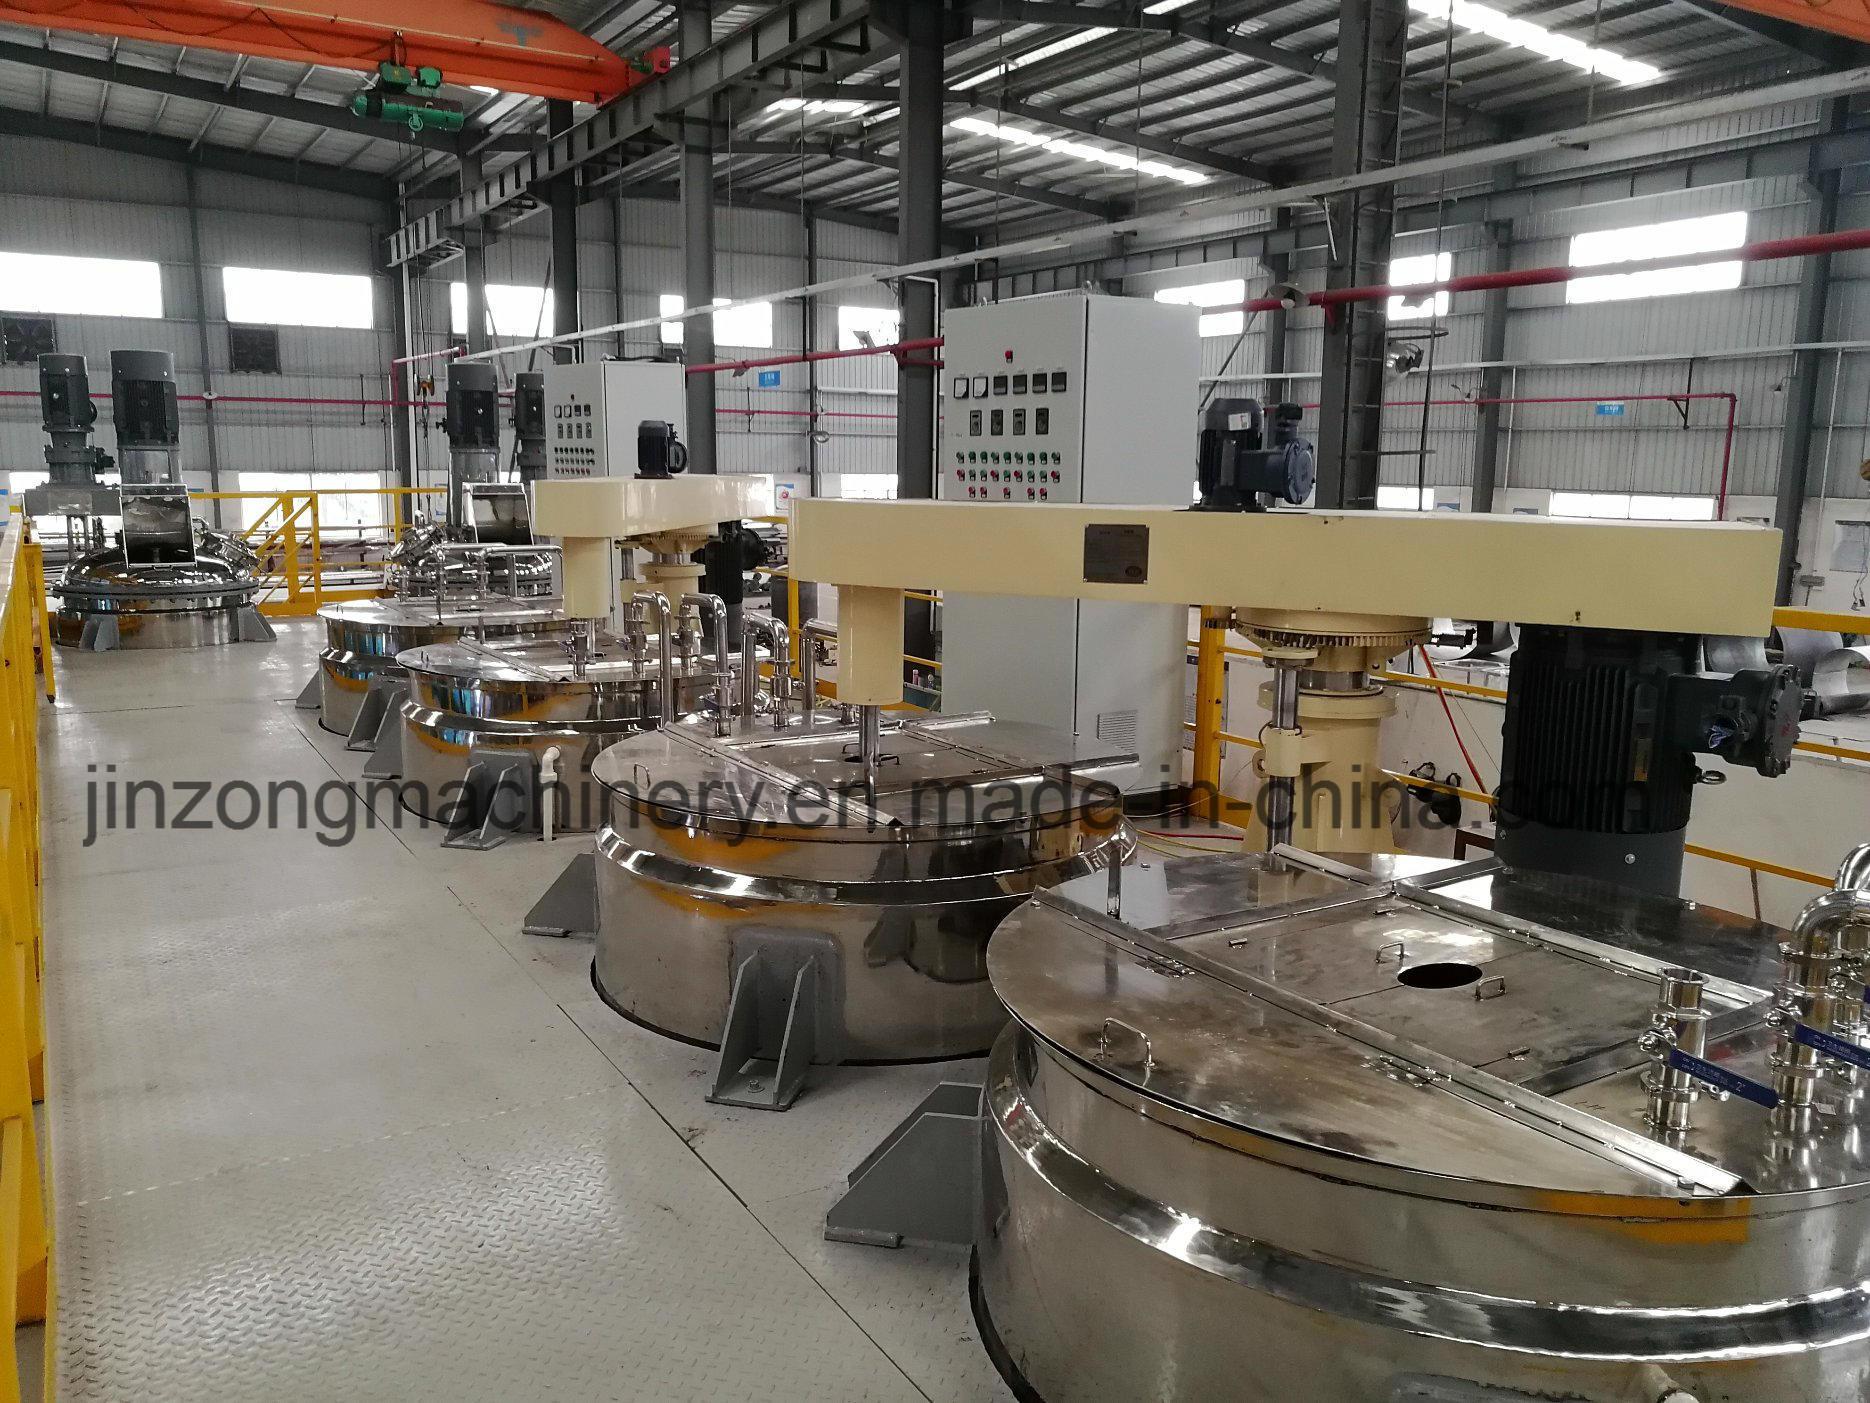 Platform Disperser Machine for Mass Production Paint